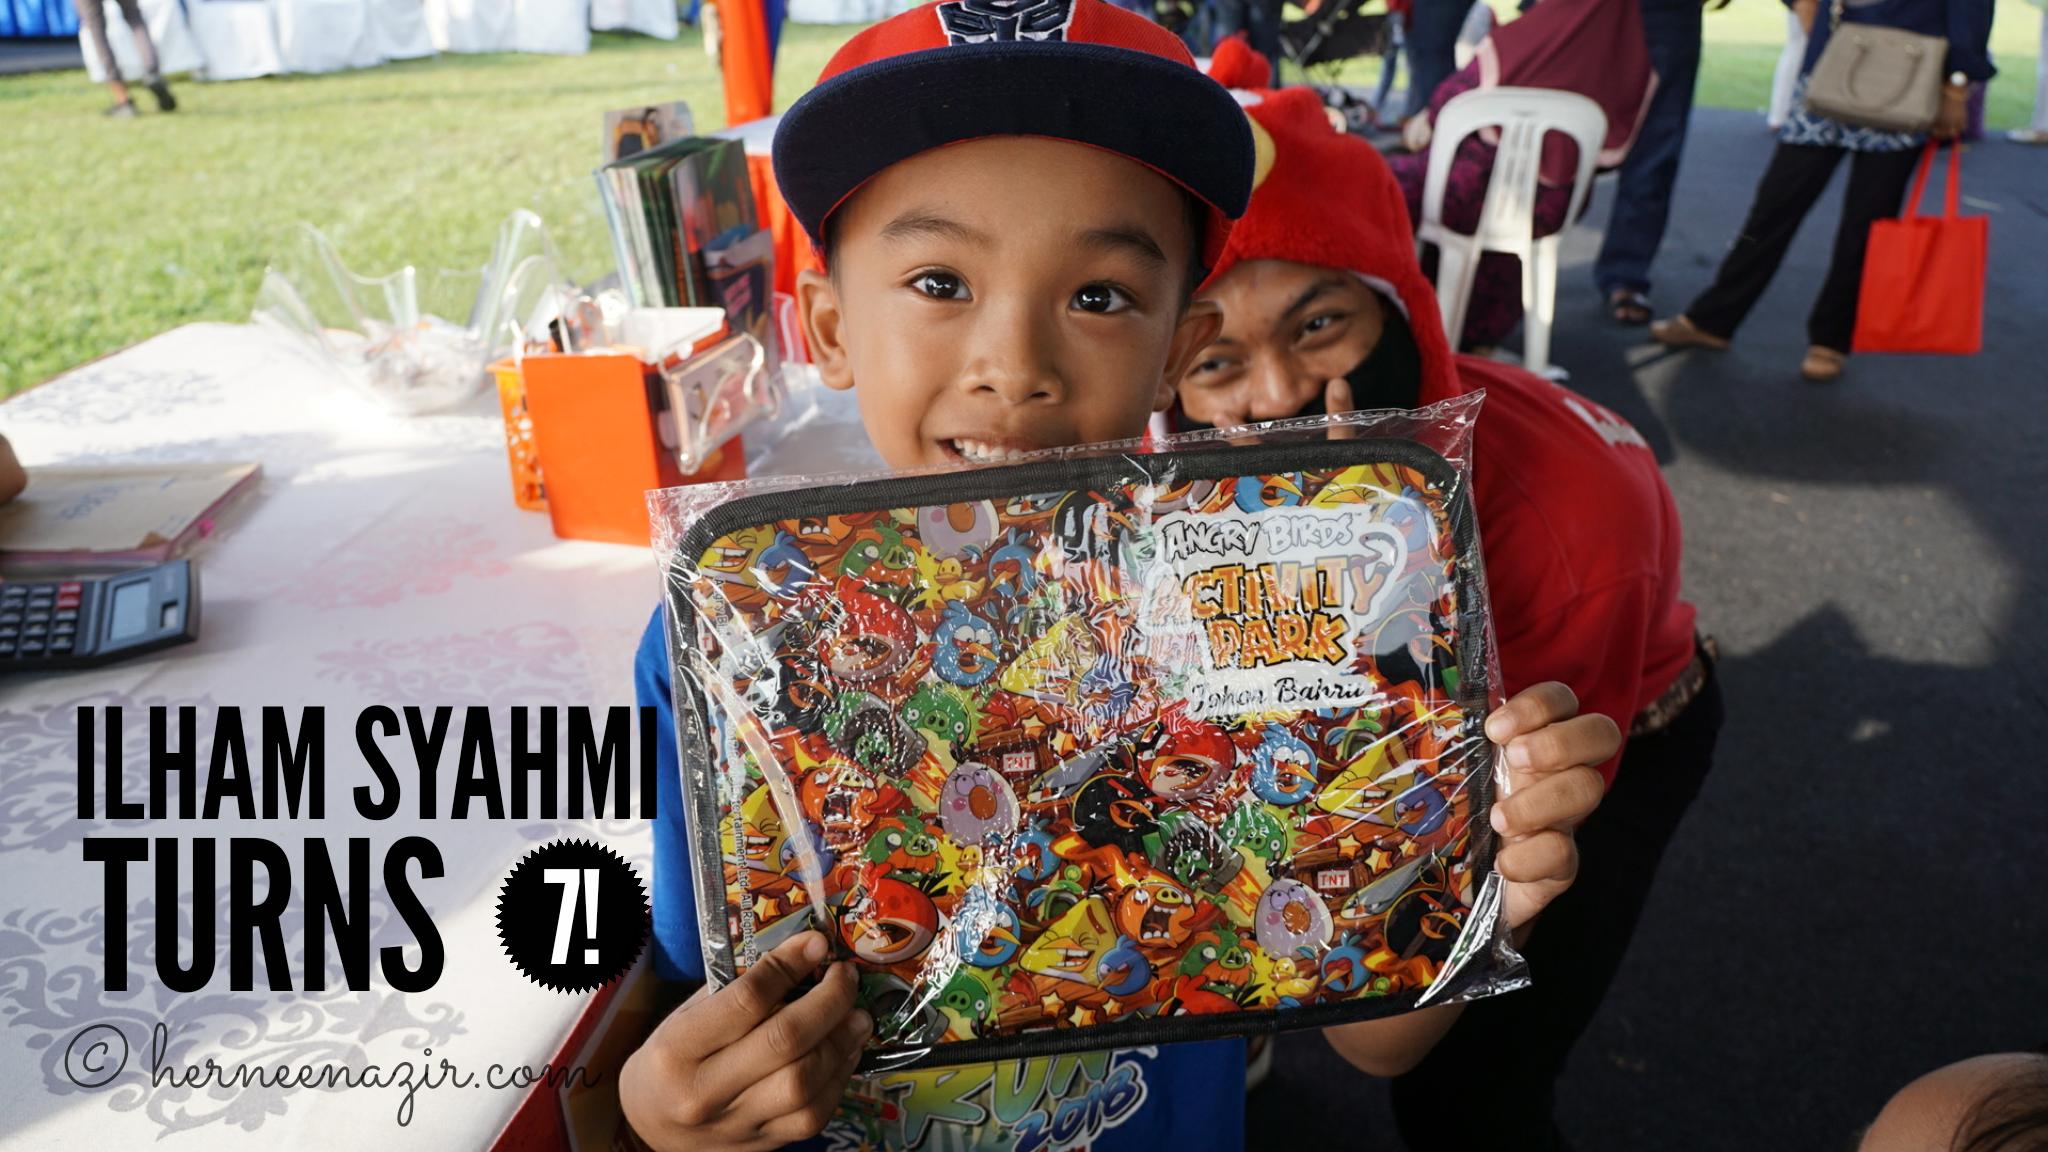 Ilham Syahmi Turns 7! (14 July 2018)